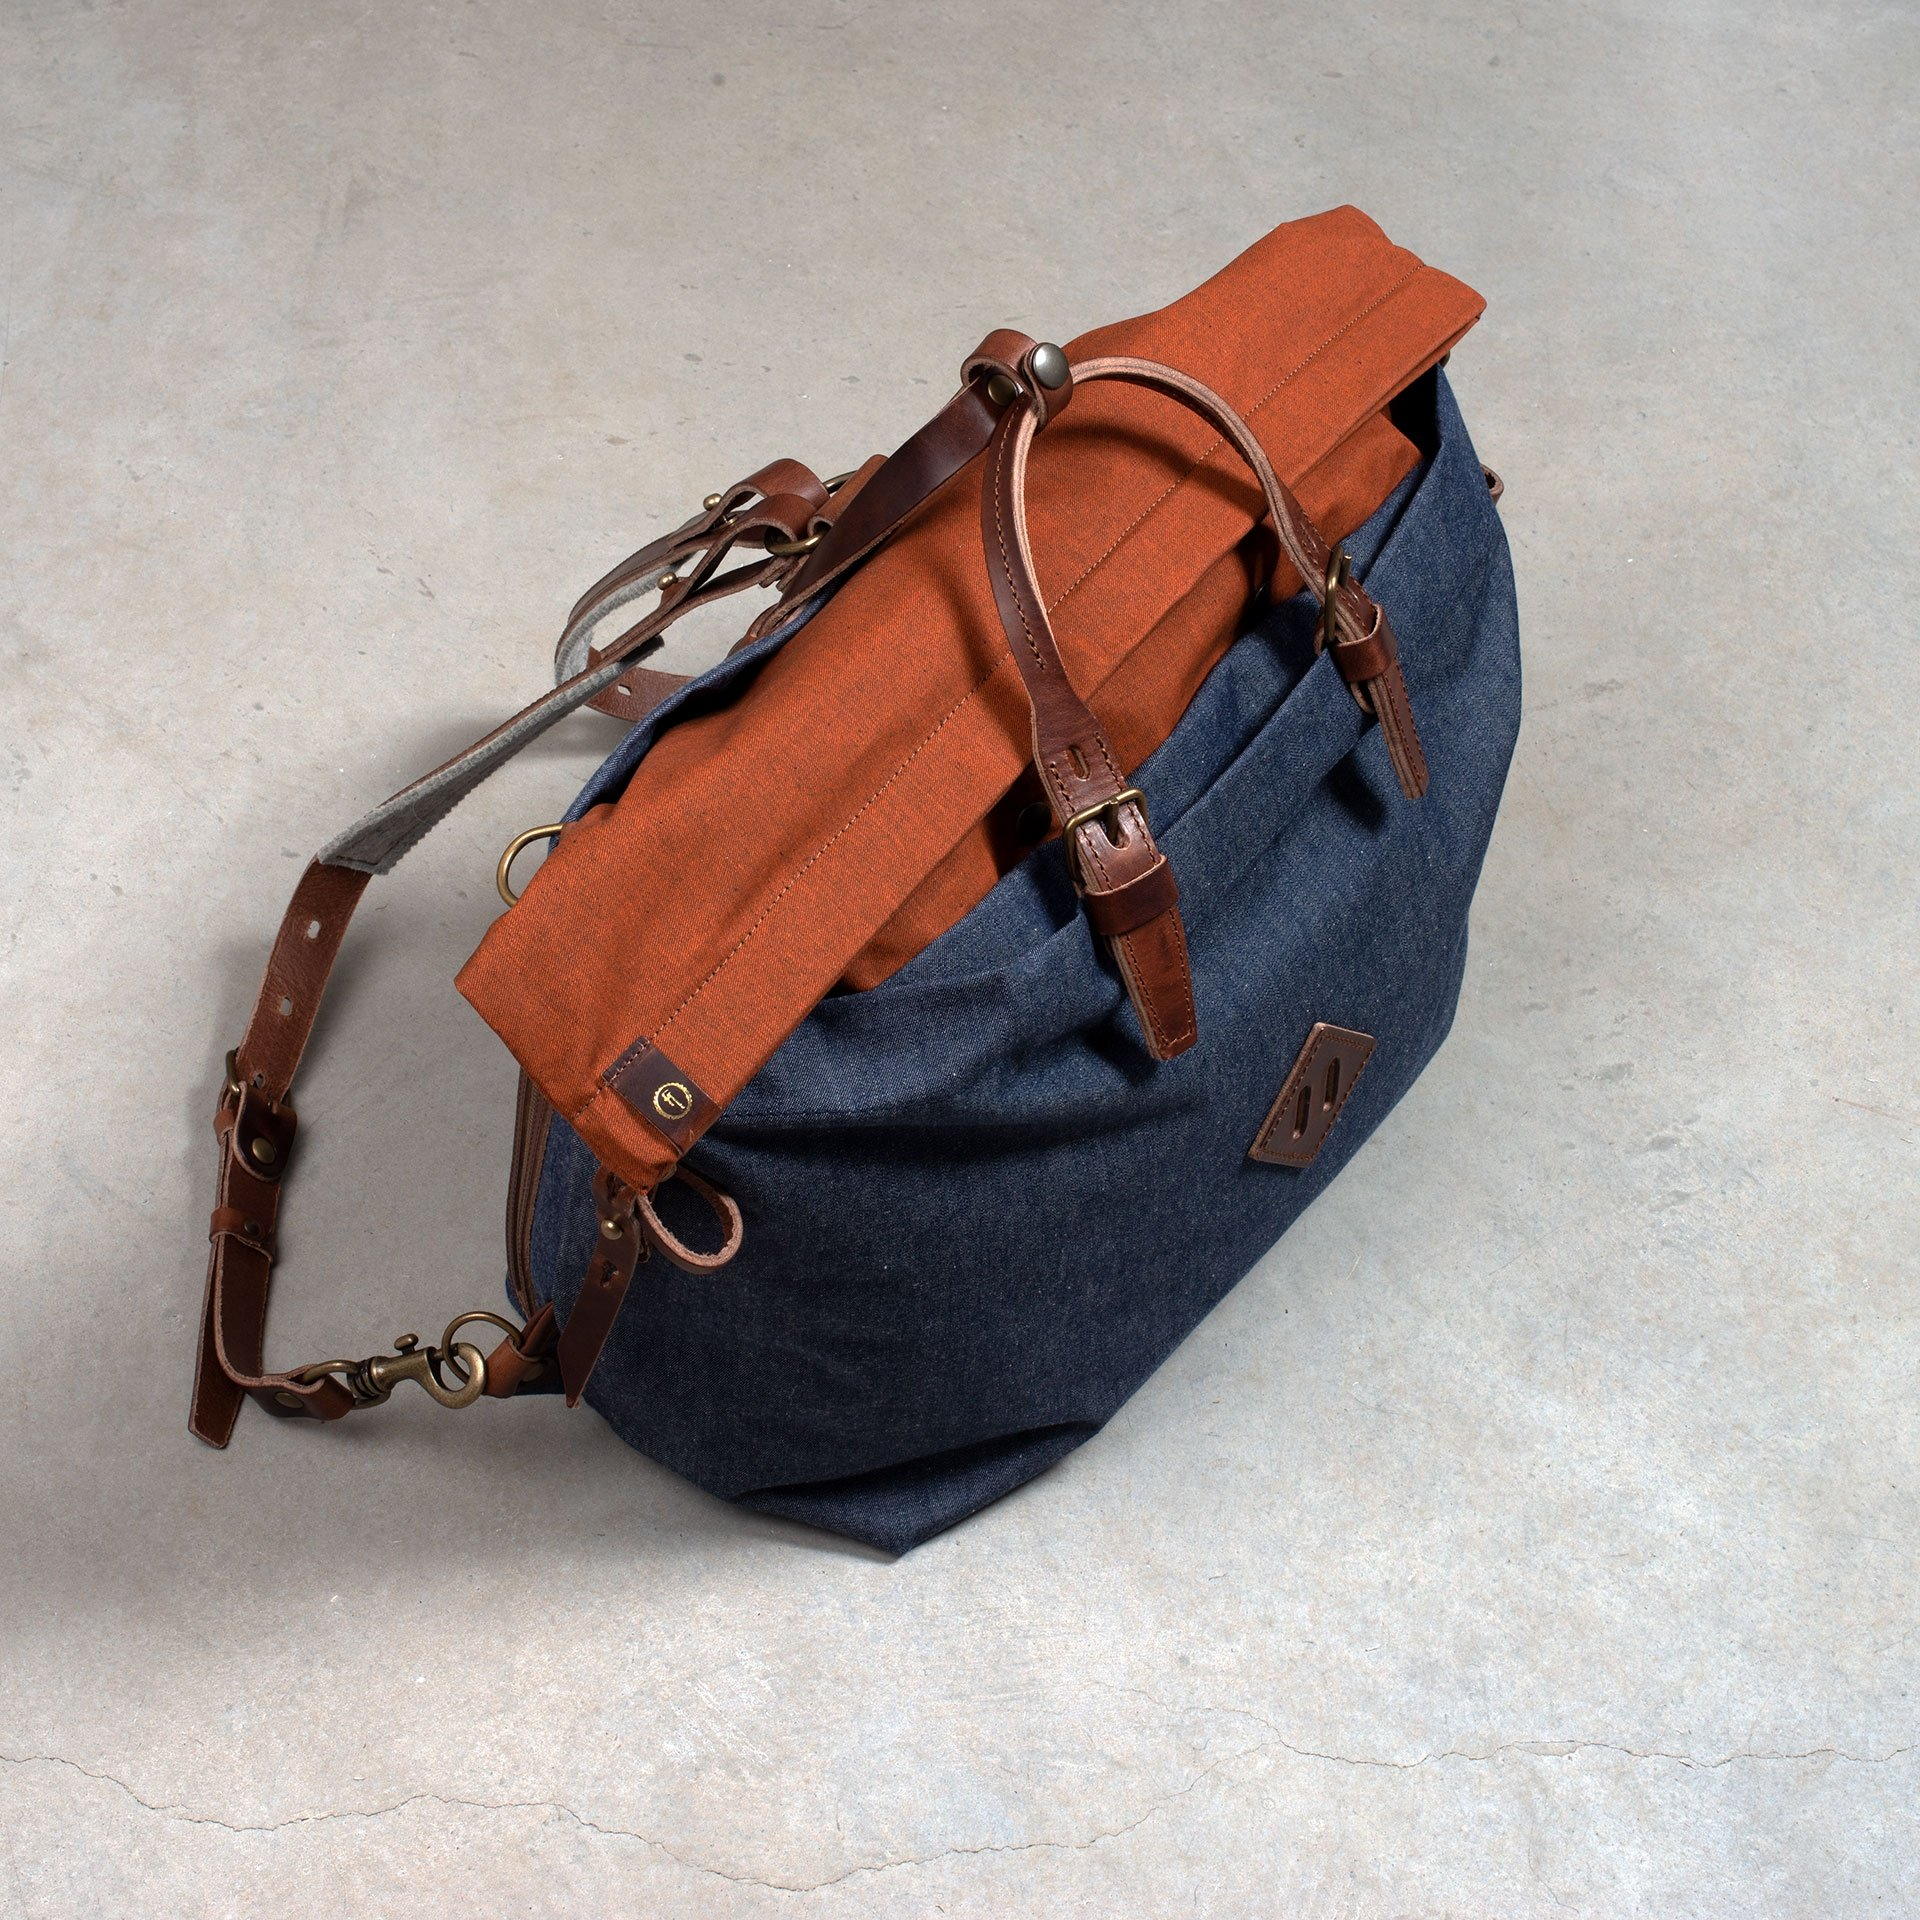 Woody L Backpack - Denim/Terra cotta (image n°5)